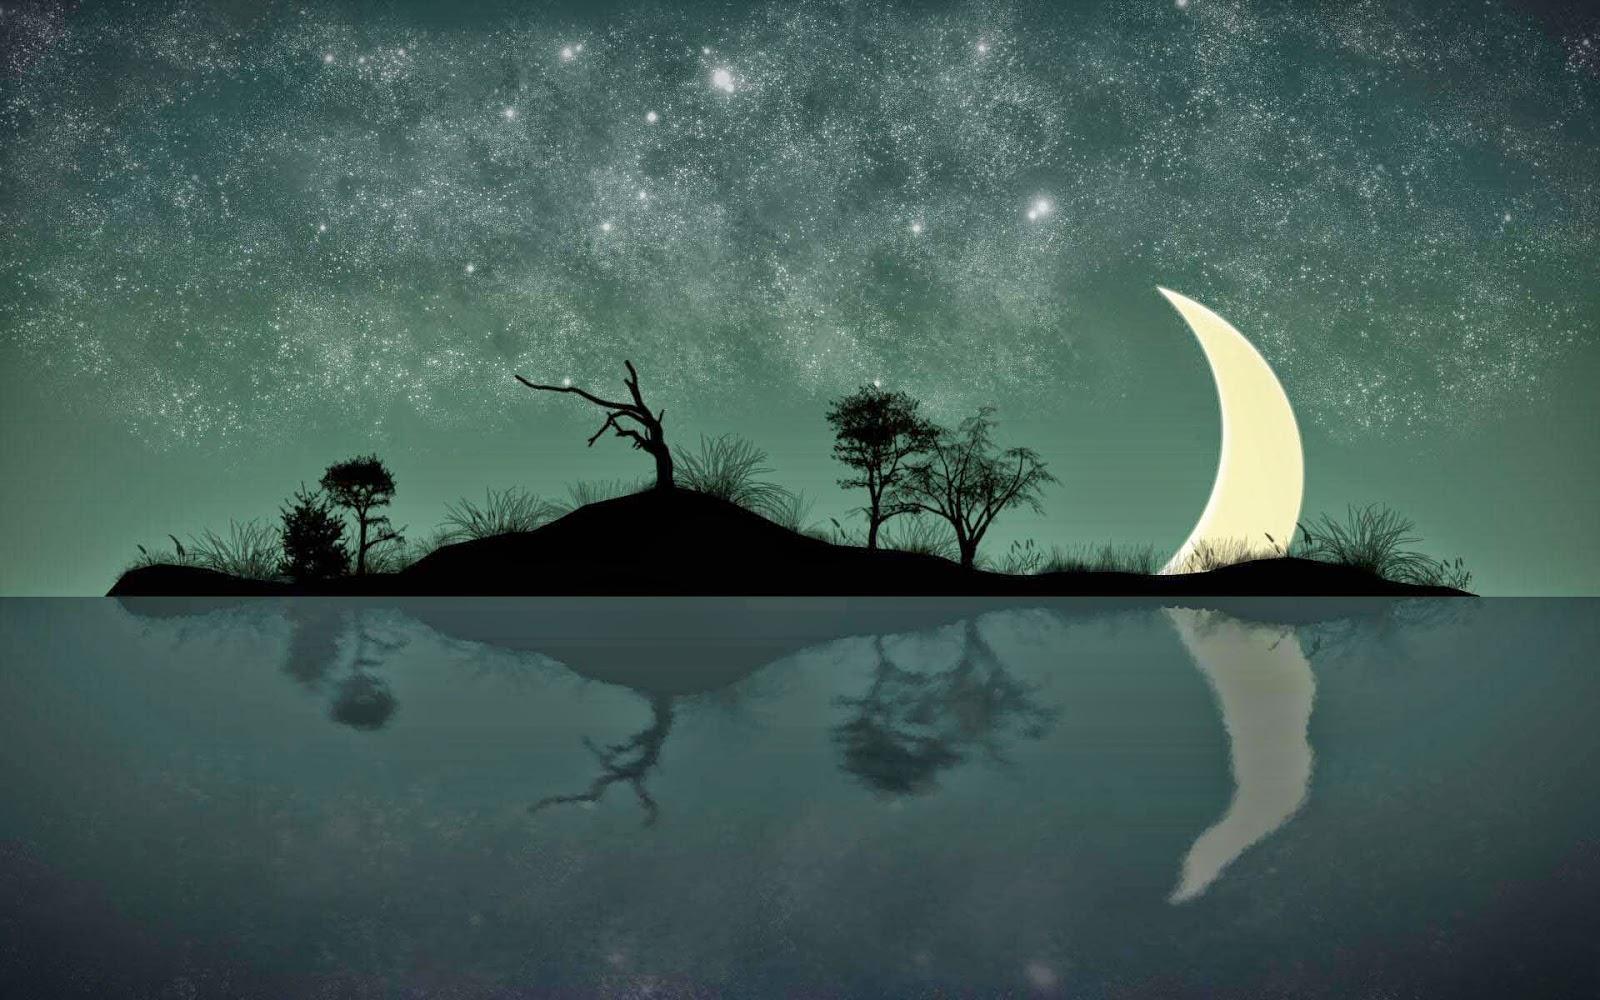 moon-night-wallpapers